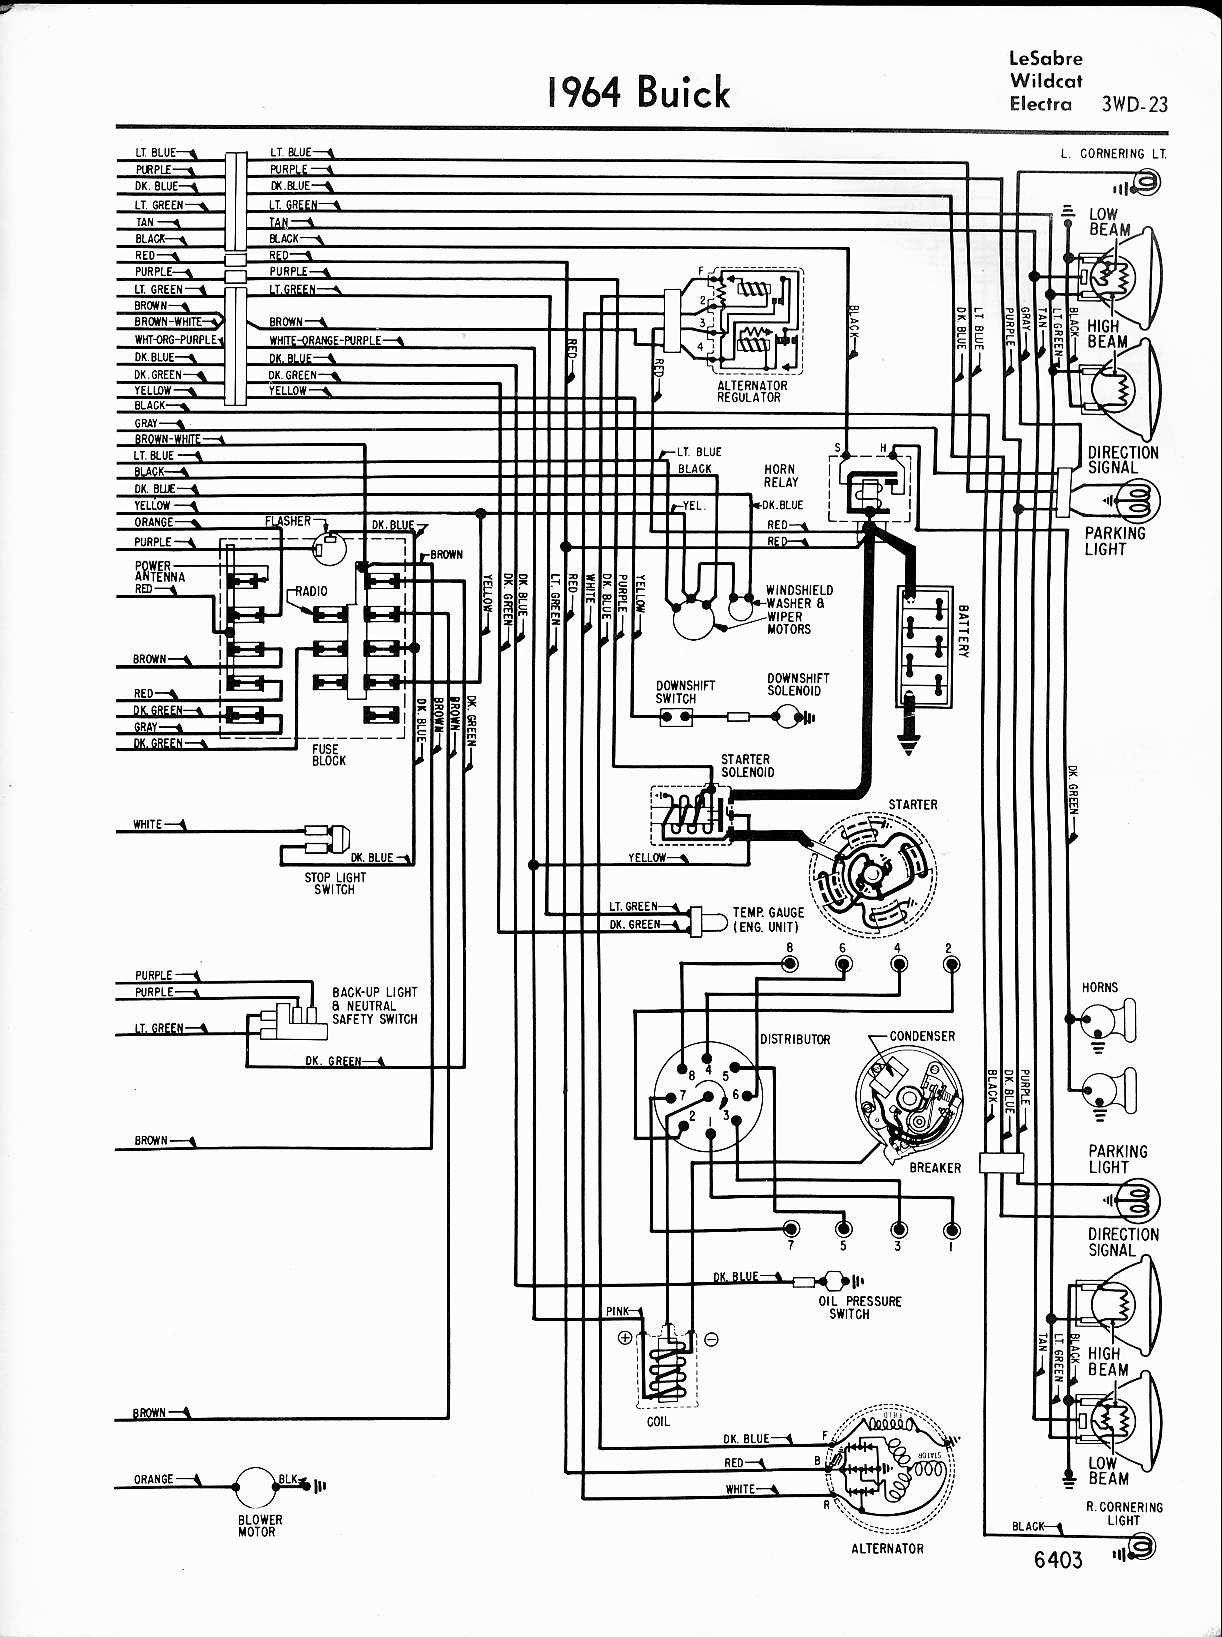 2002 Buick Century Wiring Diagram Diagram Electrical Diagram Buick Lesabre